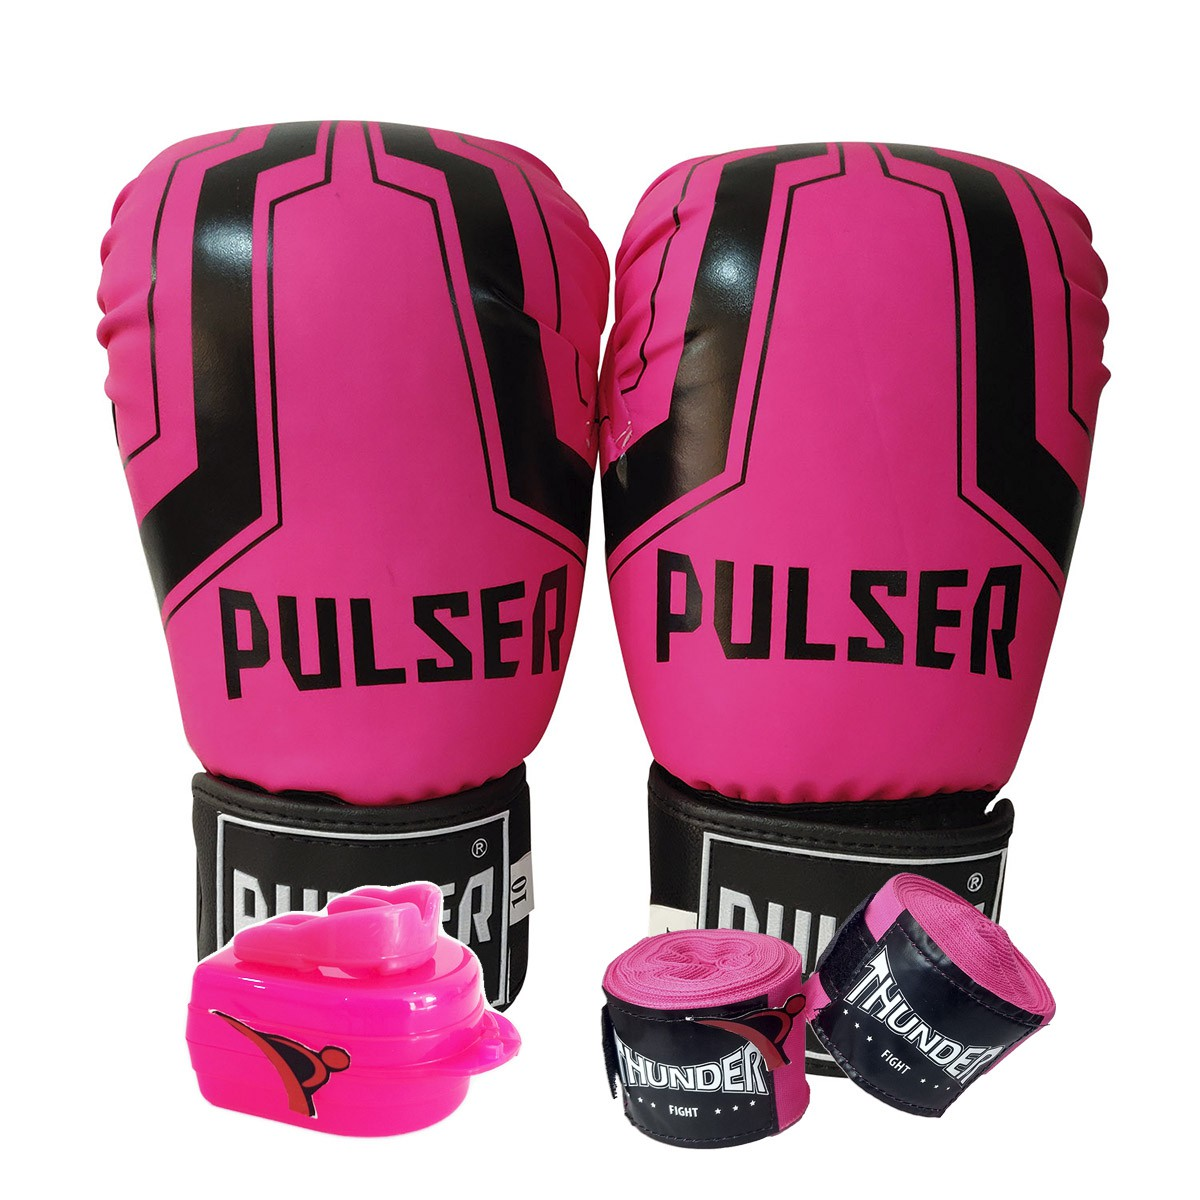 Kit de Boxe / Muay Thai Feminino 12oz - Rosa Iron  - Pulser  - PRALUTA SHOP